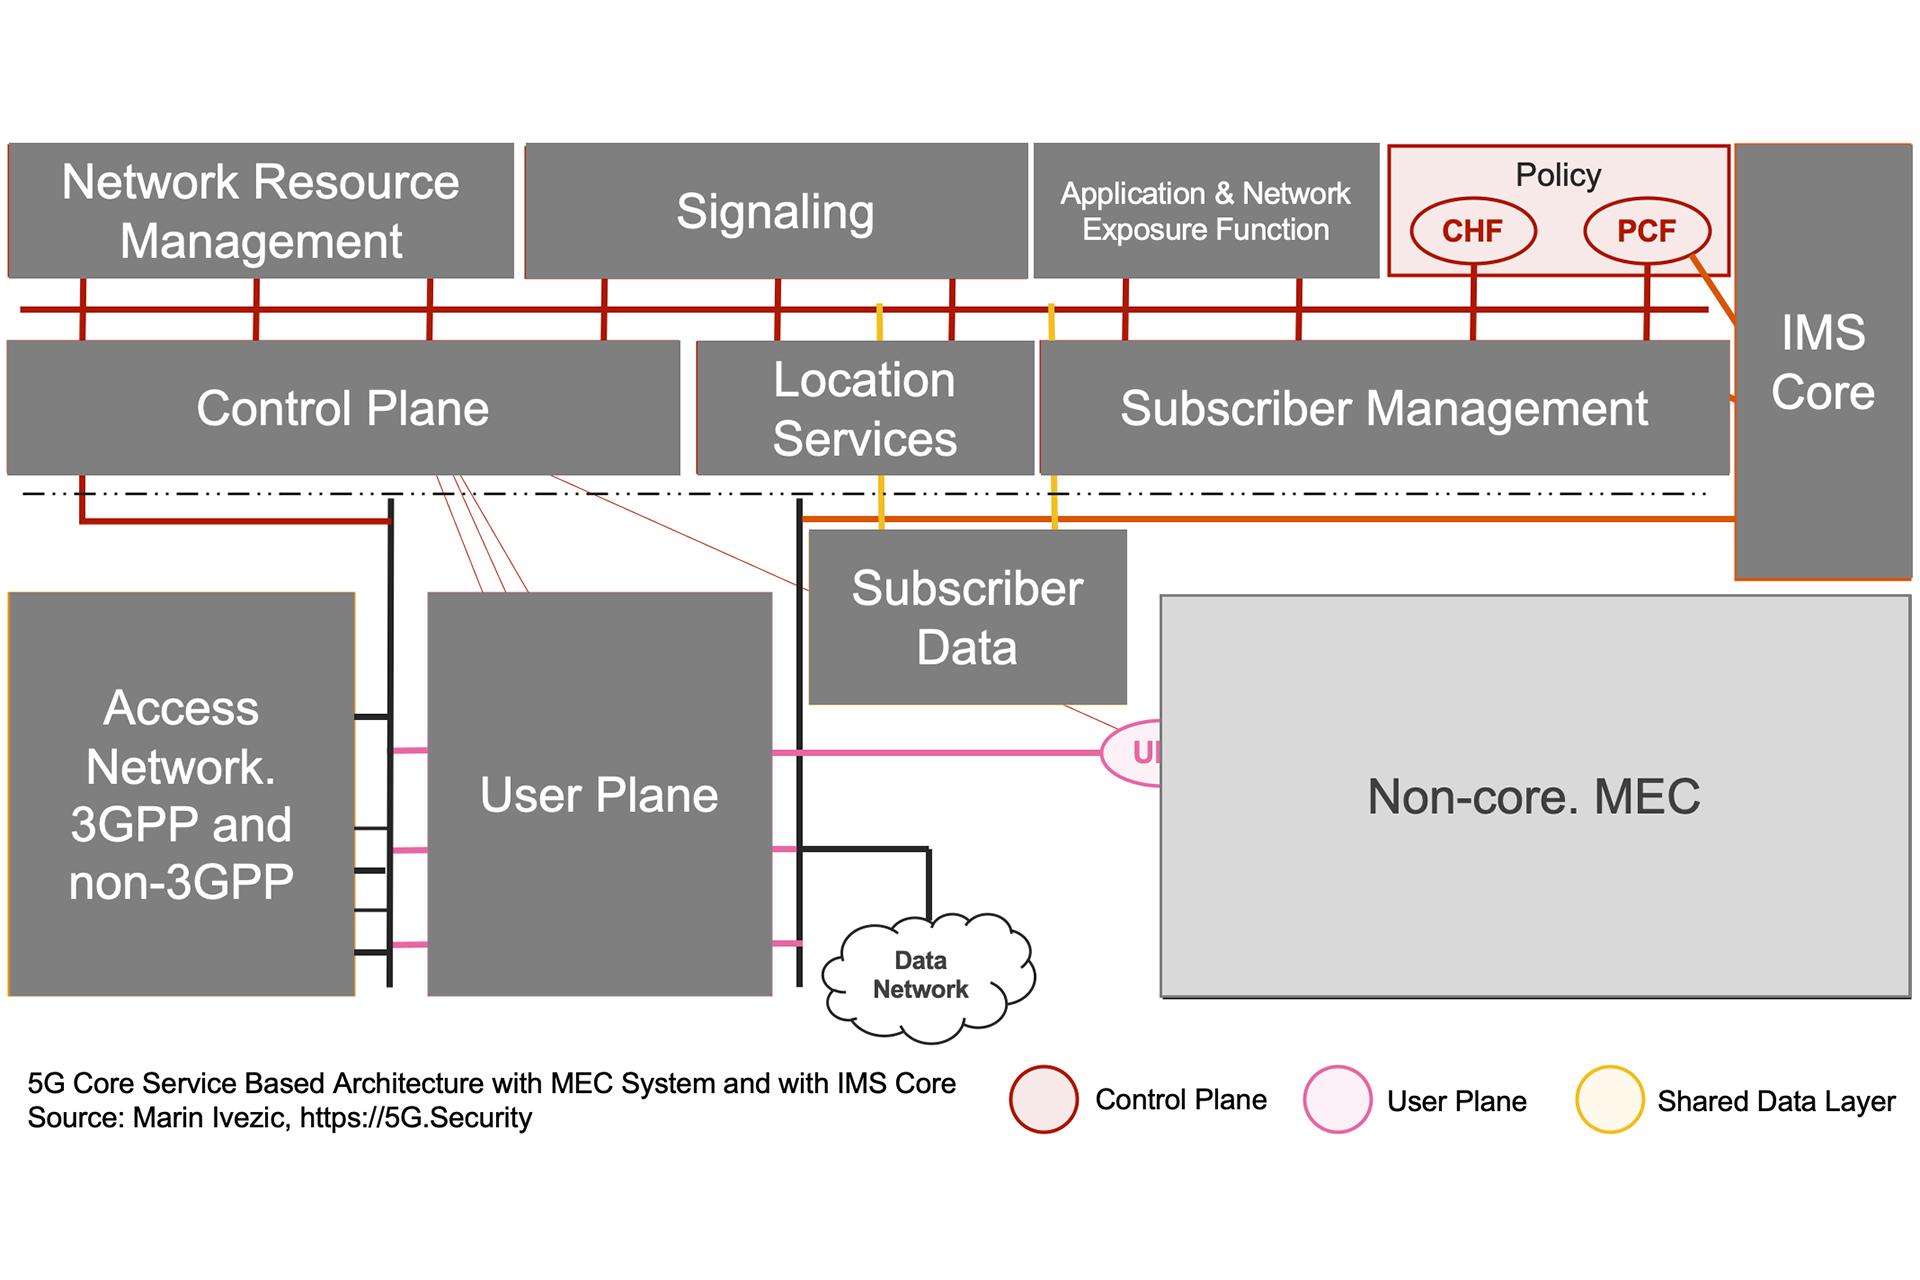 5G SBA IMS MEC Architecture - Policy